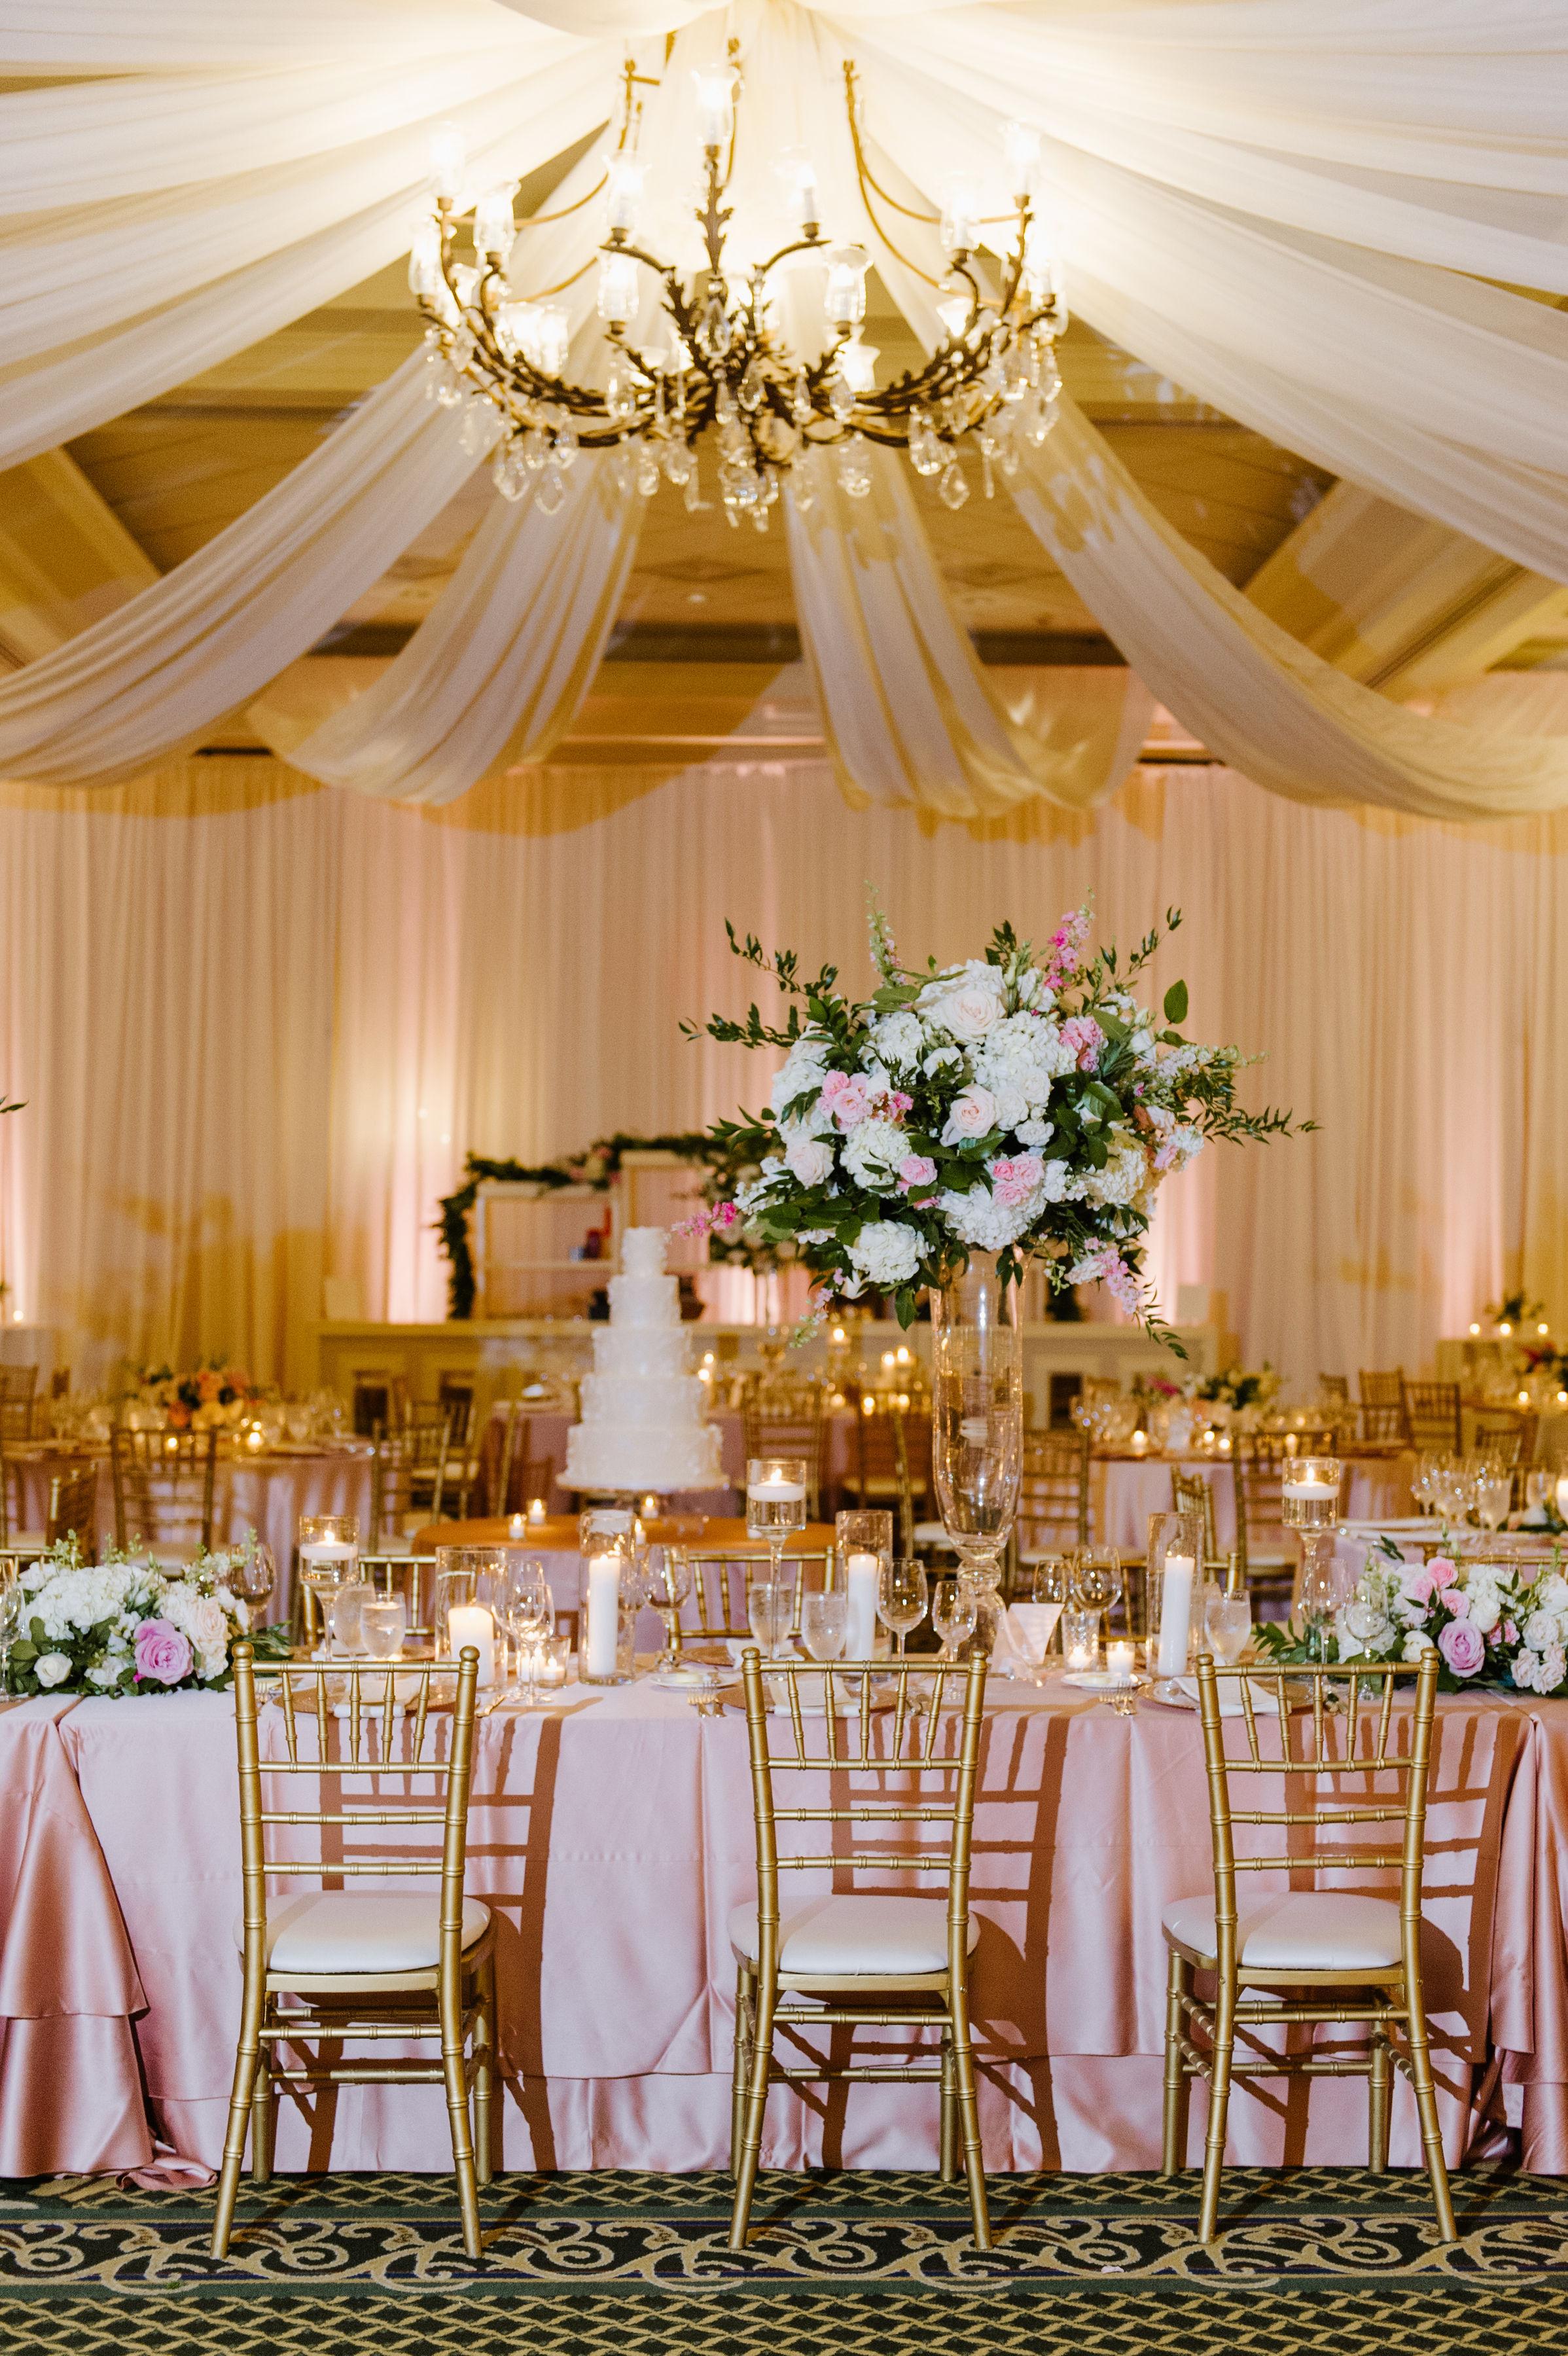 McElravey_Wedding_CarolineLimaPhotography_2018_270.jpg